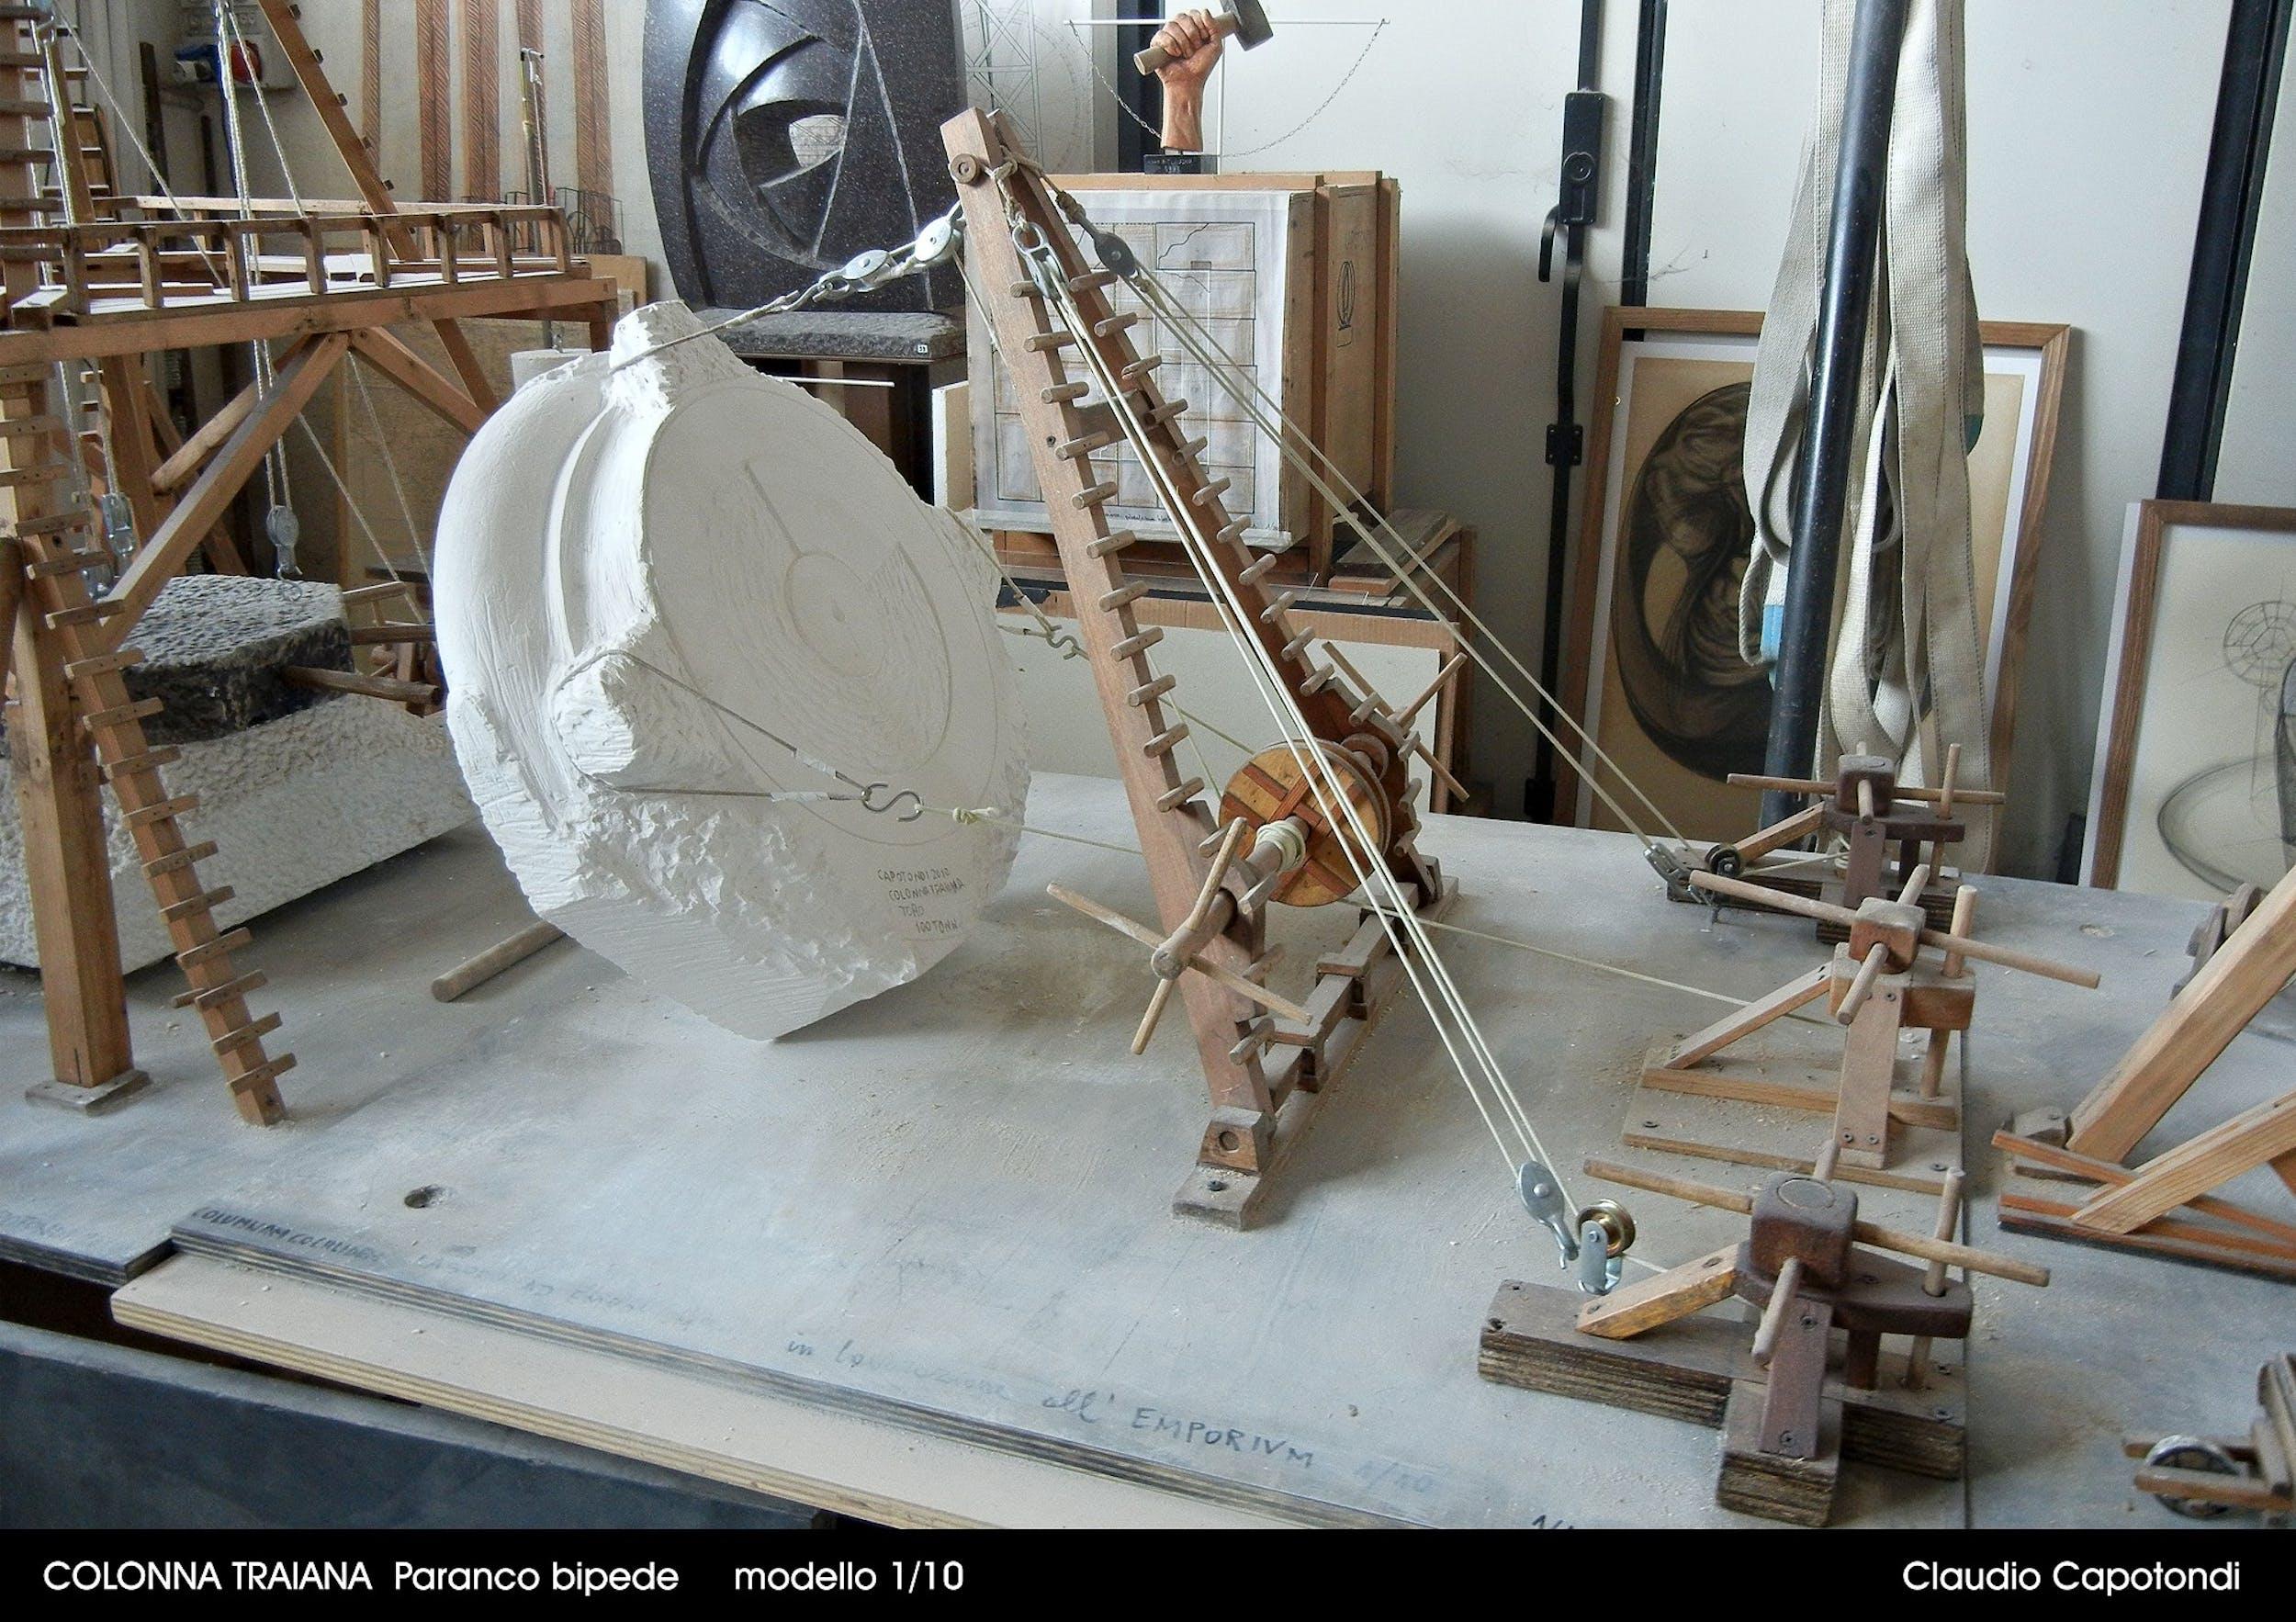 Fig. 13 Claudio Capotondi Gru a due sostegni Modello in scala 1:10 | Fig. 13 Claudio Capotondi Two-Masted Crane Model in 1:10 scale